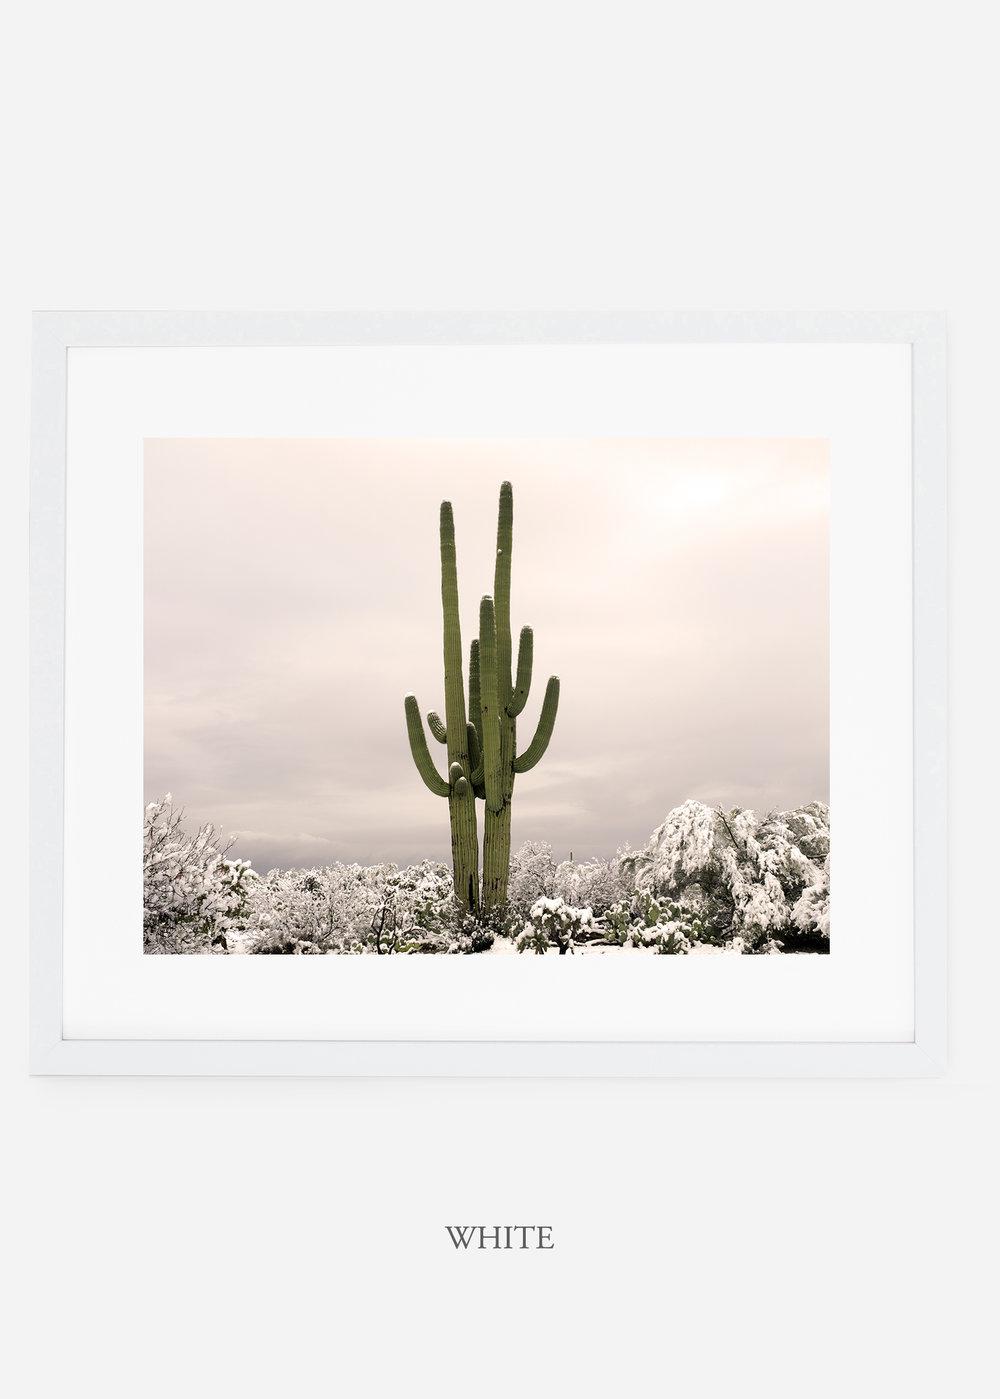 whiteframe-saguaroNo.5-wildercalifornia-art-wallart-cactusprint-homedecor-prints-arizona-botanical-artwork-interiordesign.jpg